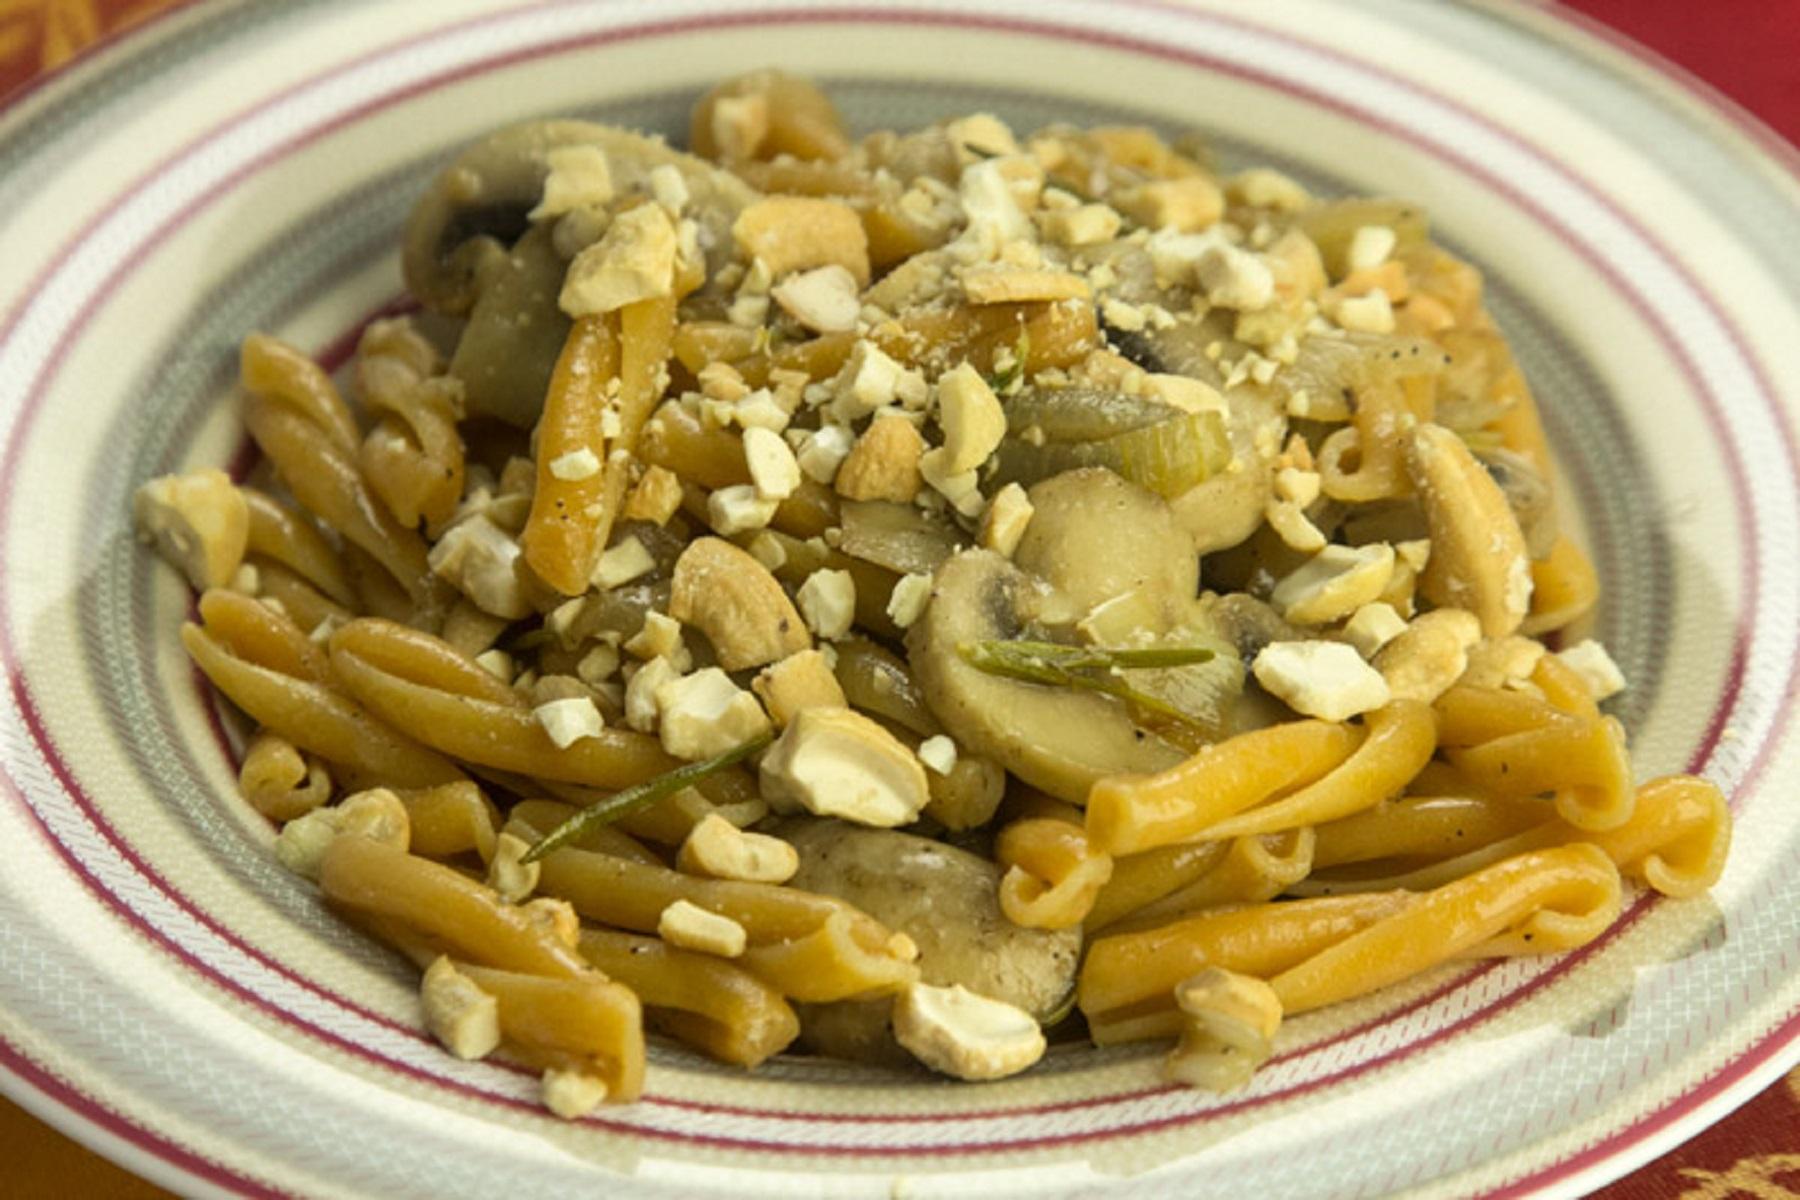 Vegan Συνταγή: Καζαρέτσε από ρεβίθια με μανιτάρια & κάσιους